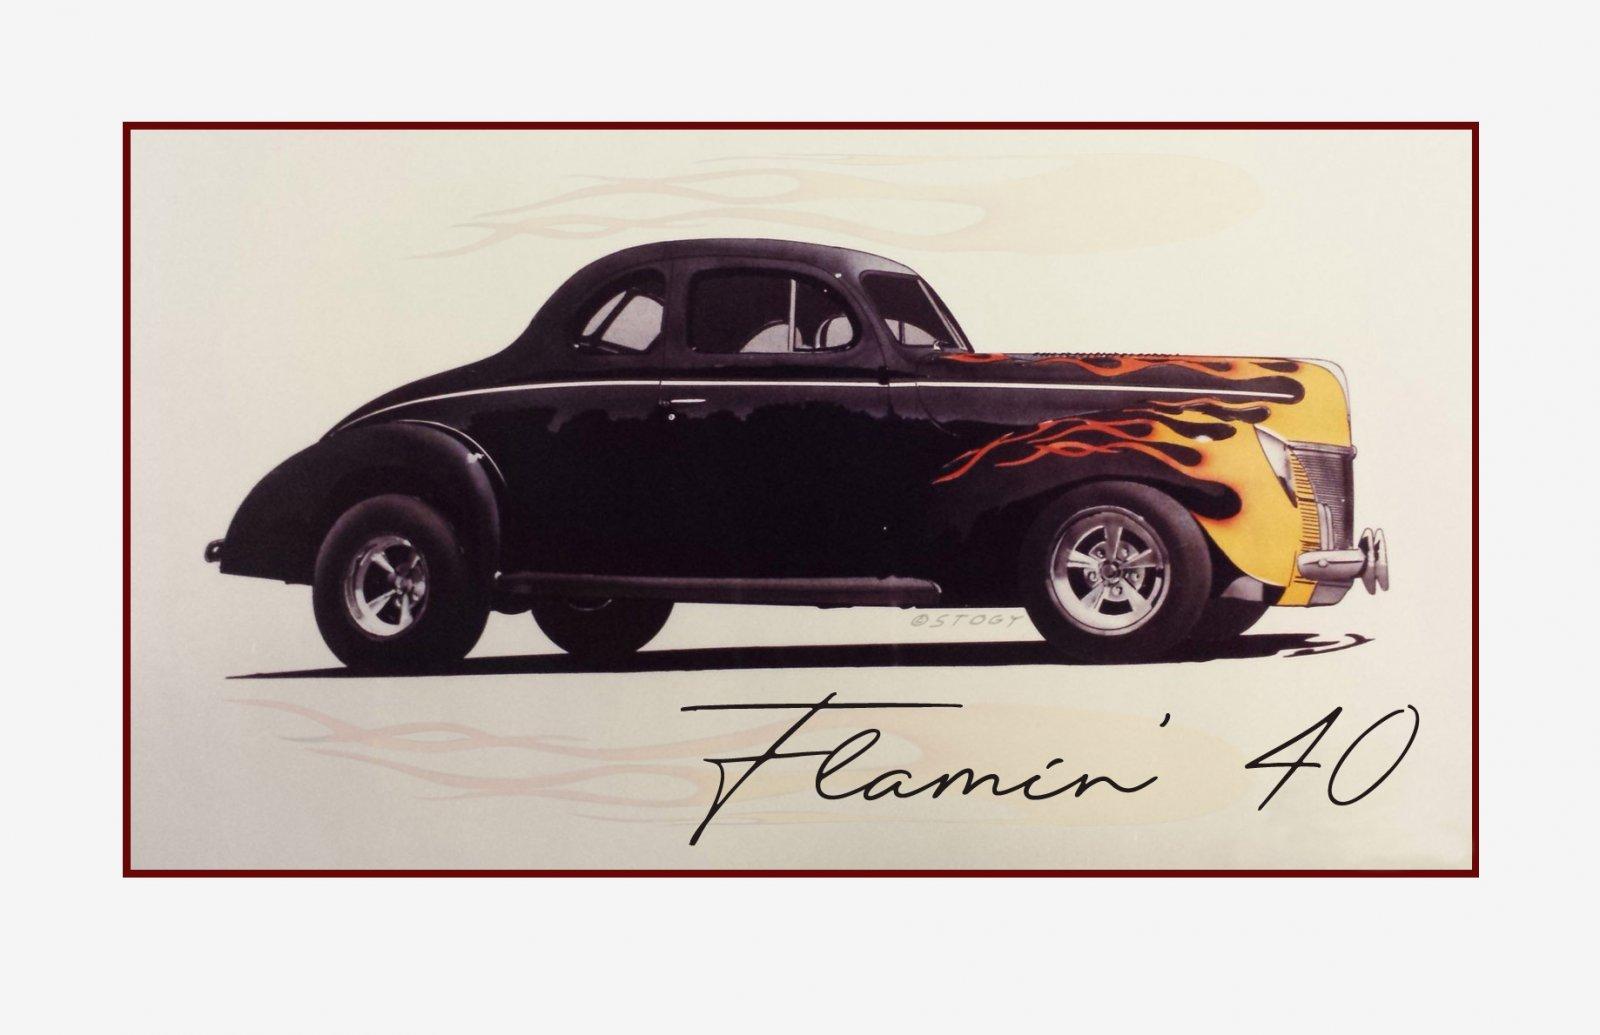 Flamin_40_CoupeV2.jpg